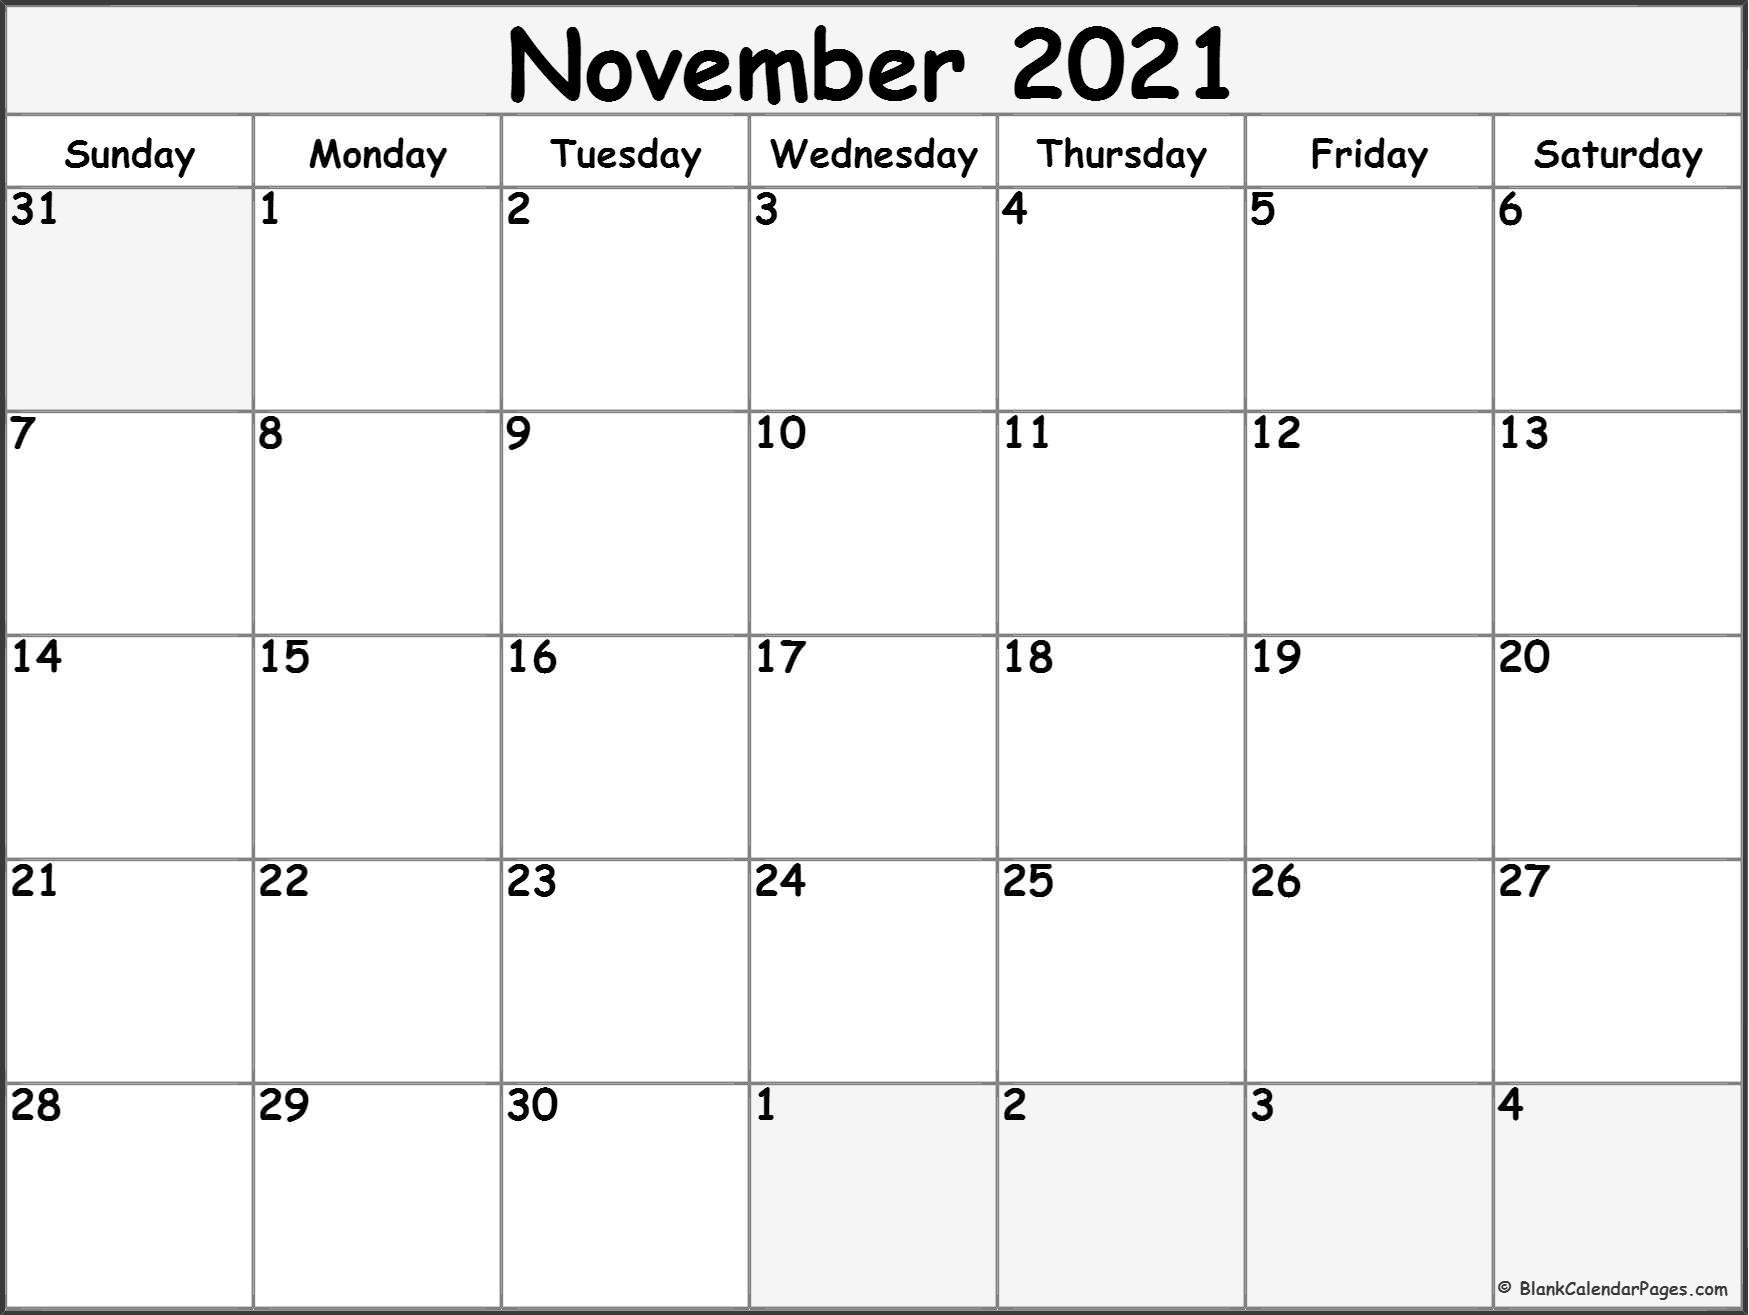 November 2021 Calendar | Free Printable Monthly Calendars Within Calendar With November 2021 Mexican Names